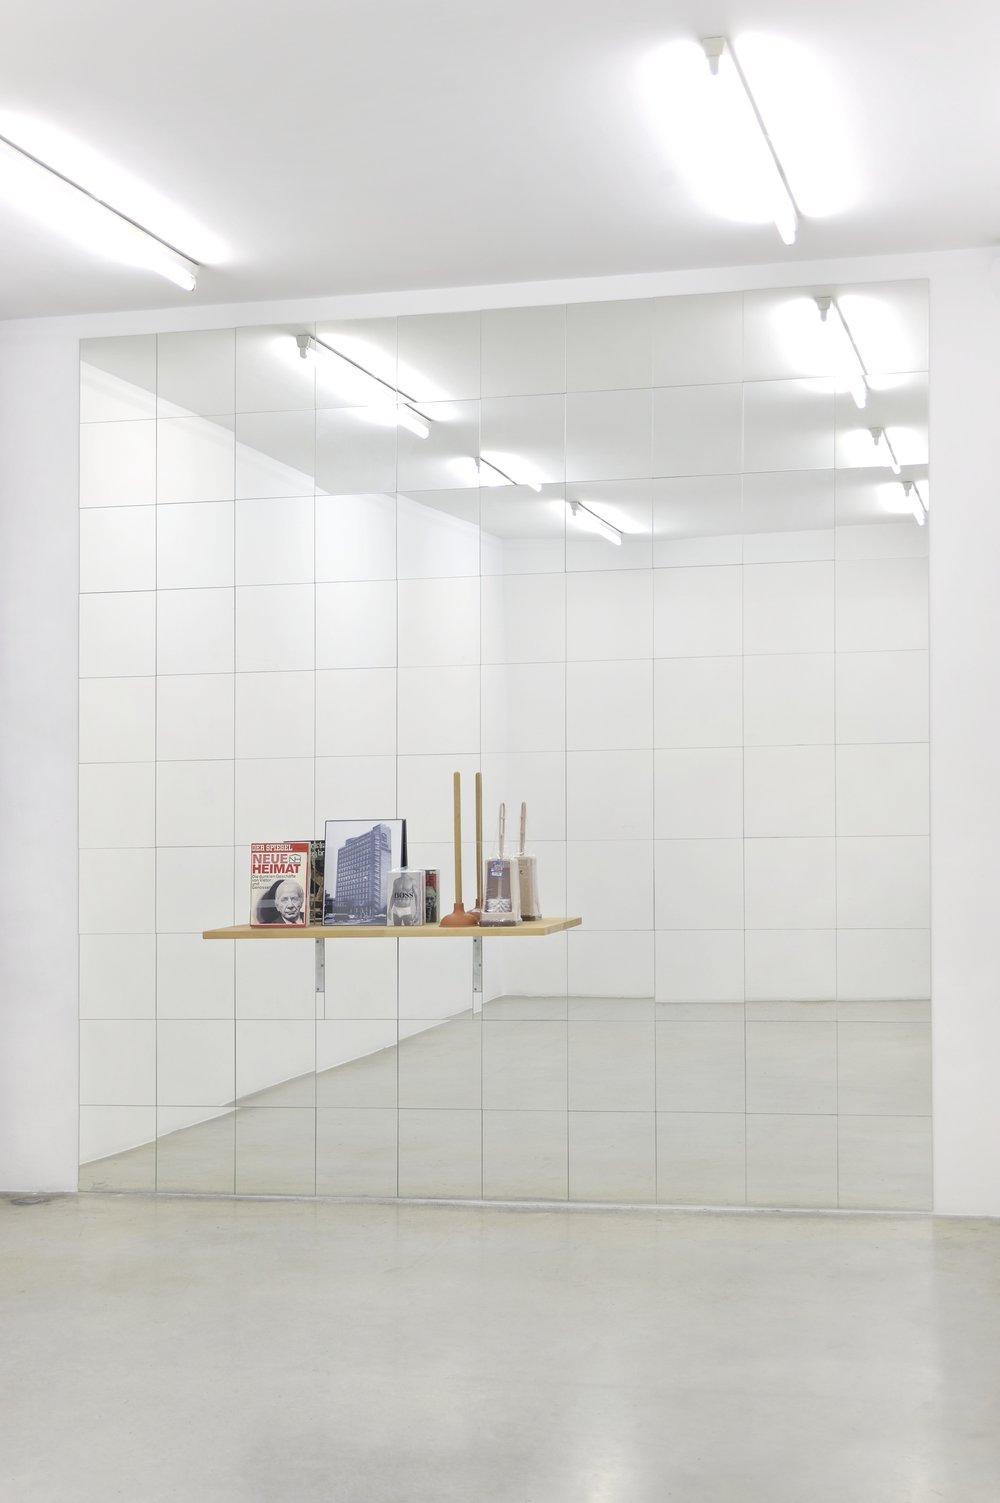 Josephine Meckseper Shelf n°25 (Neue Heimat), 2005 mirrow tile, wood, plexiglas, paper, toilet brush, toilet plunger, fabric 118 1/8 x 118 1/8 x 11 1/32 in (300 x 300 x 28 cm)